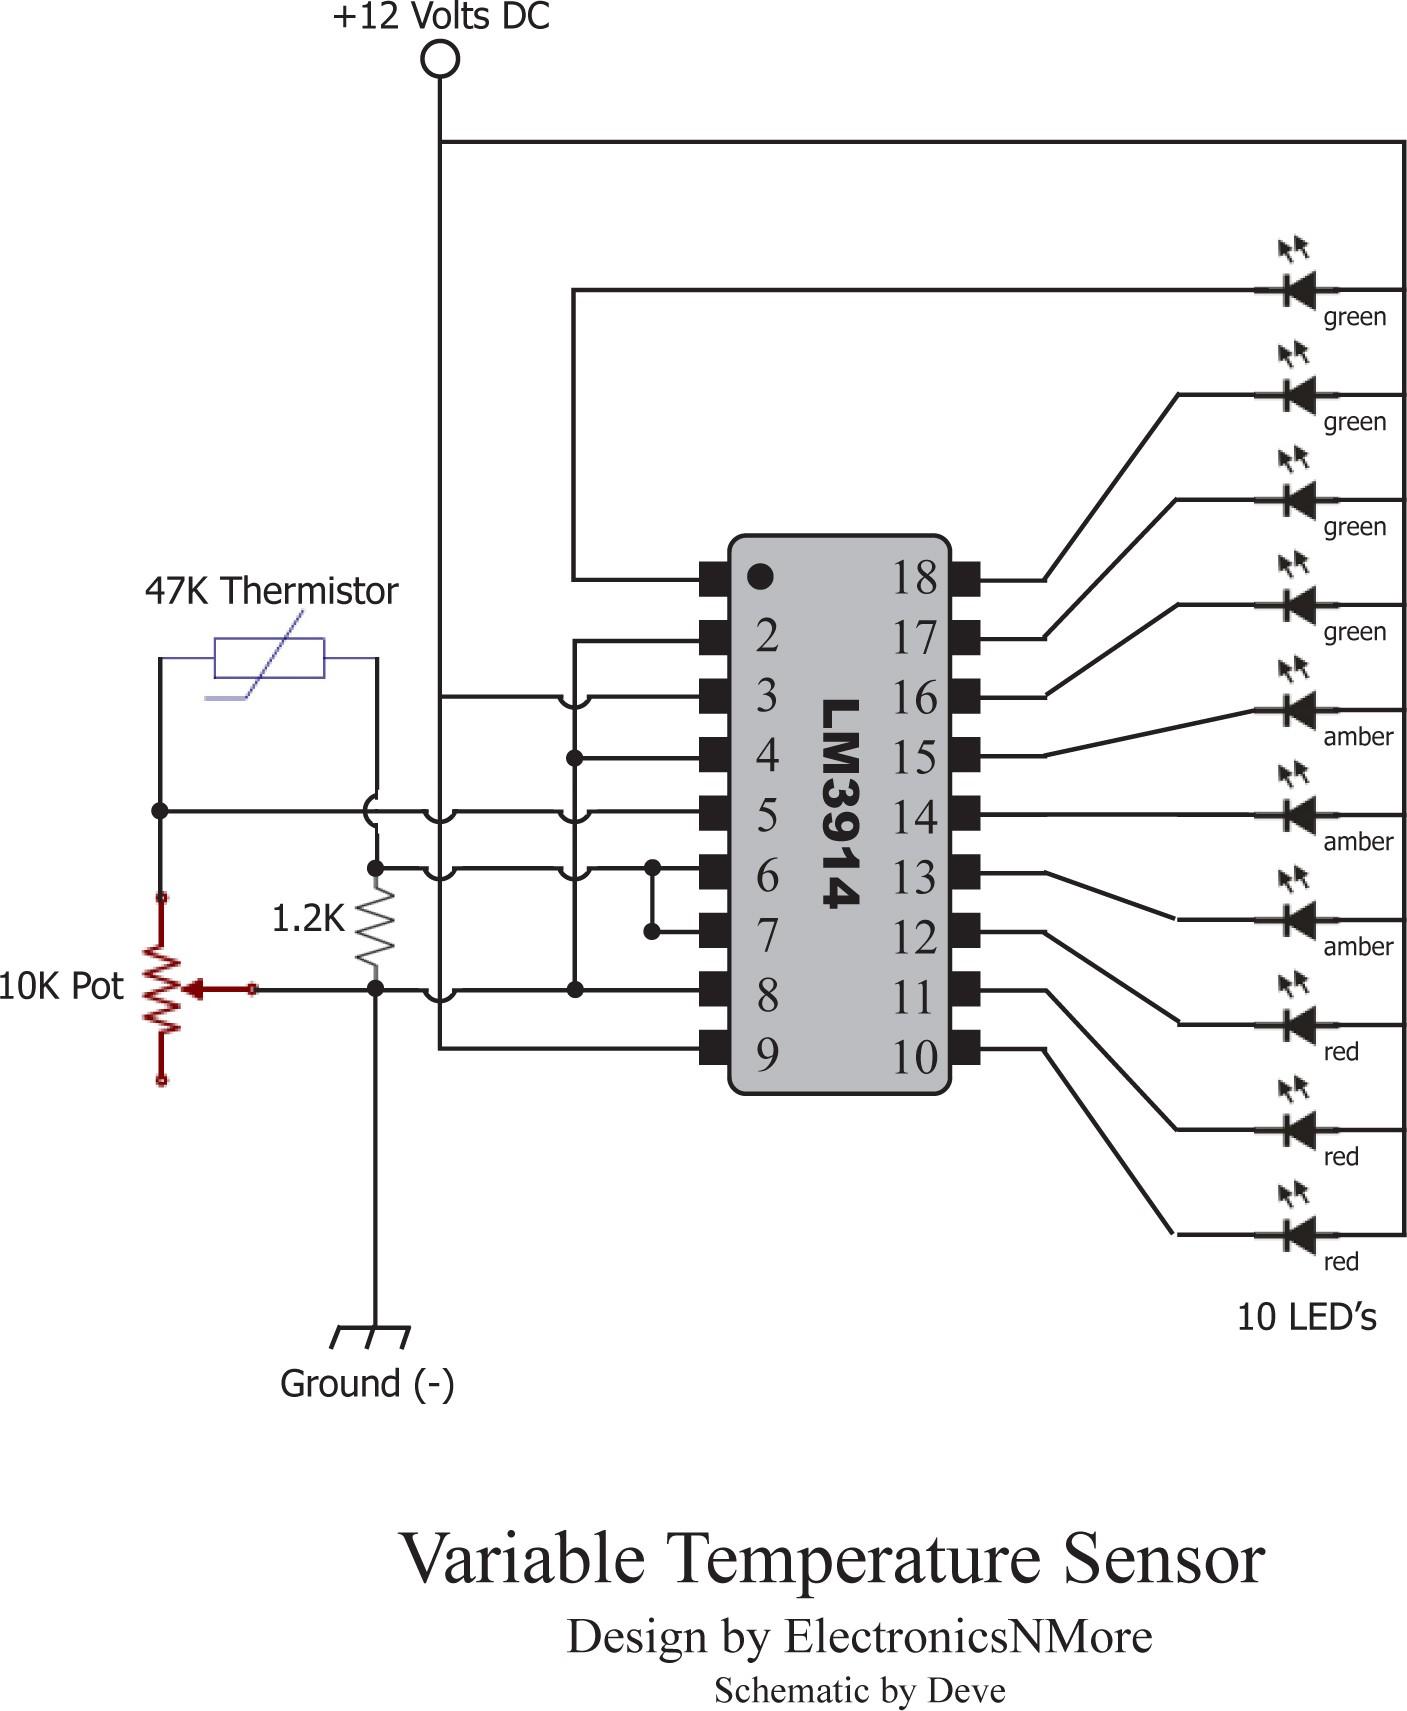 TempSensorSchematiclg